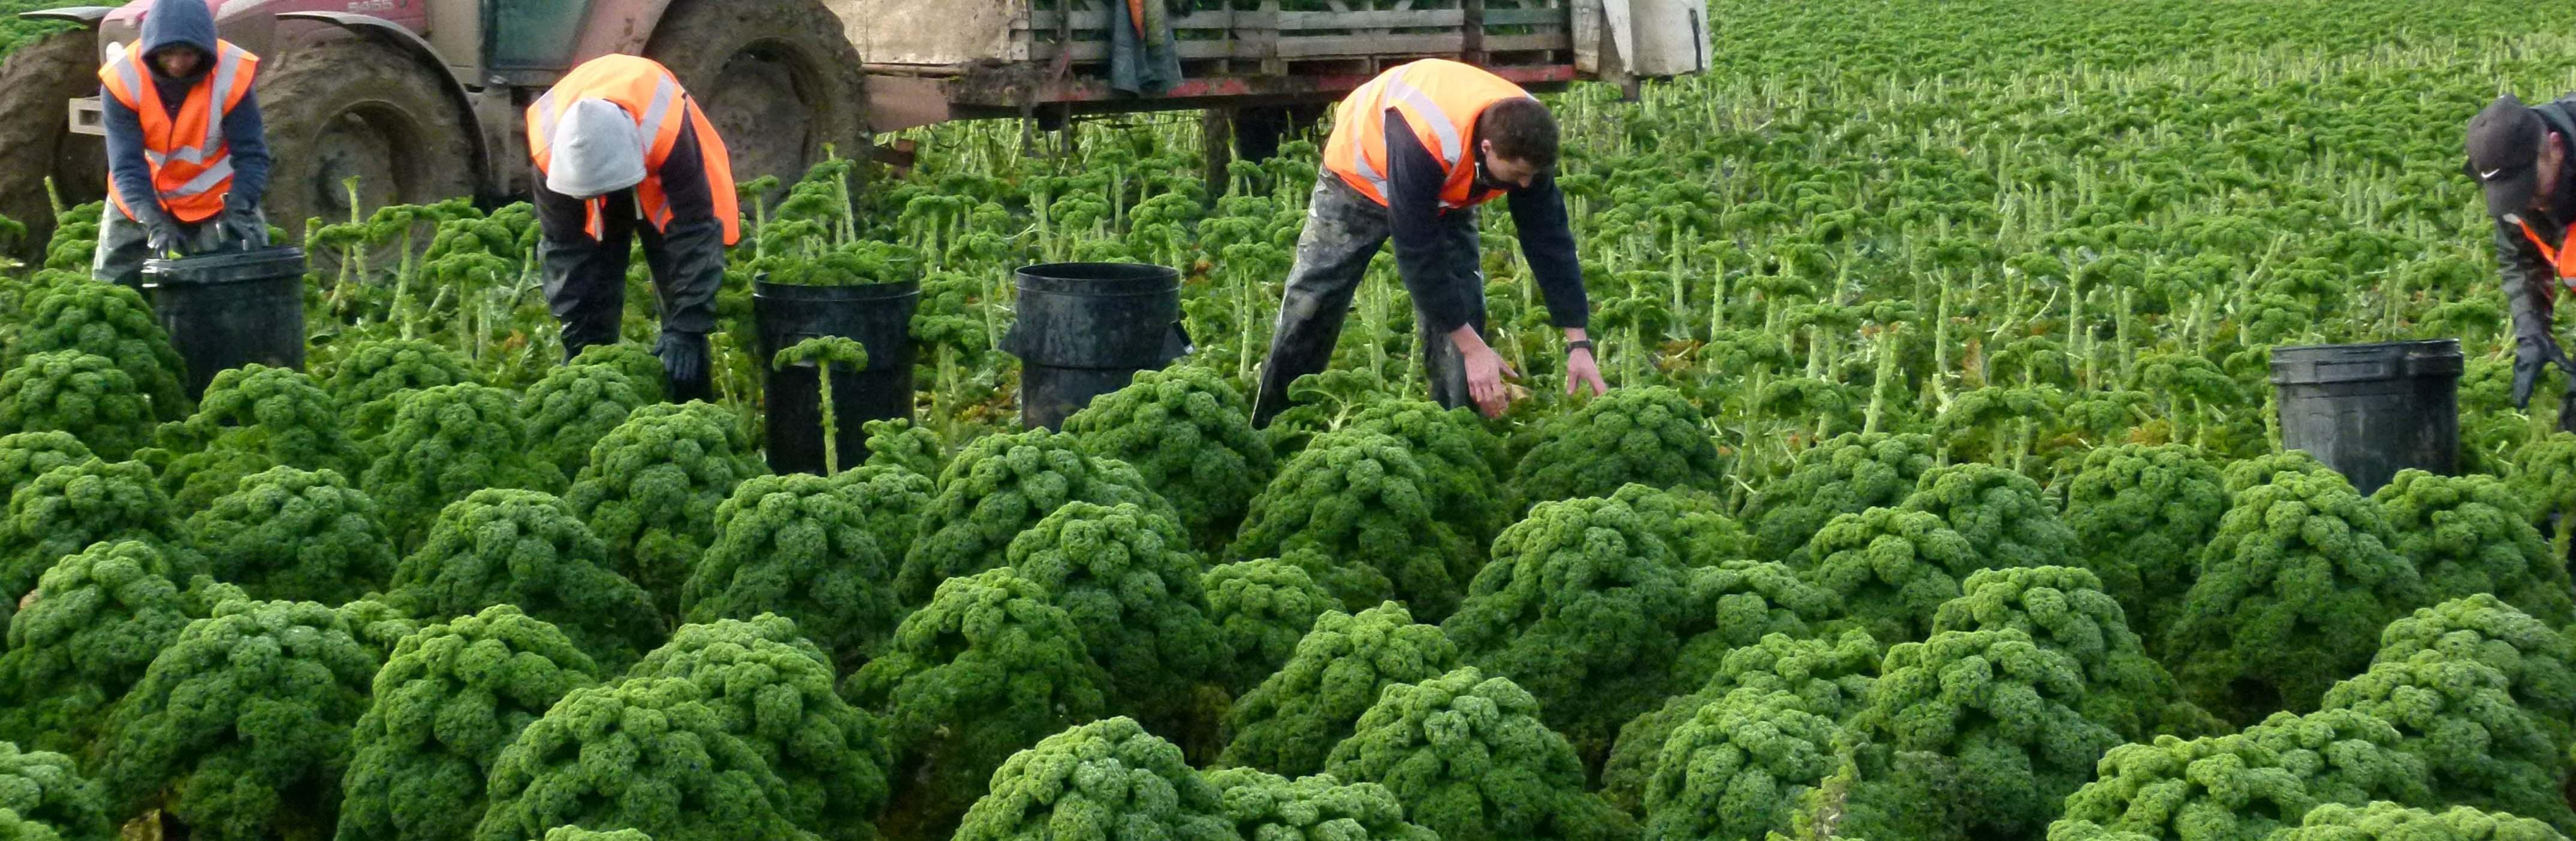 Pirates Cutters - Harvesting Broccoli